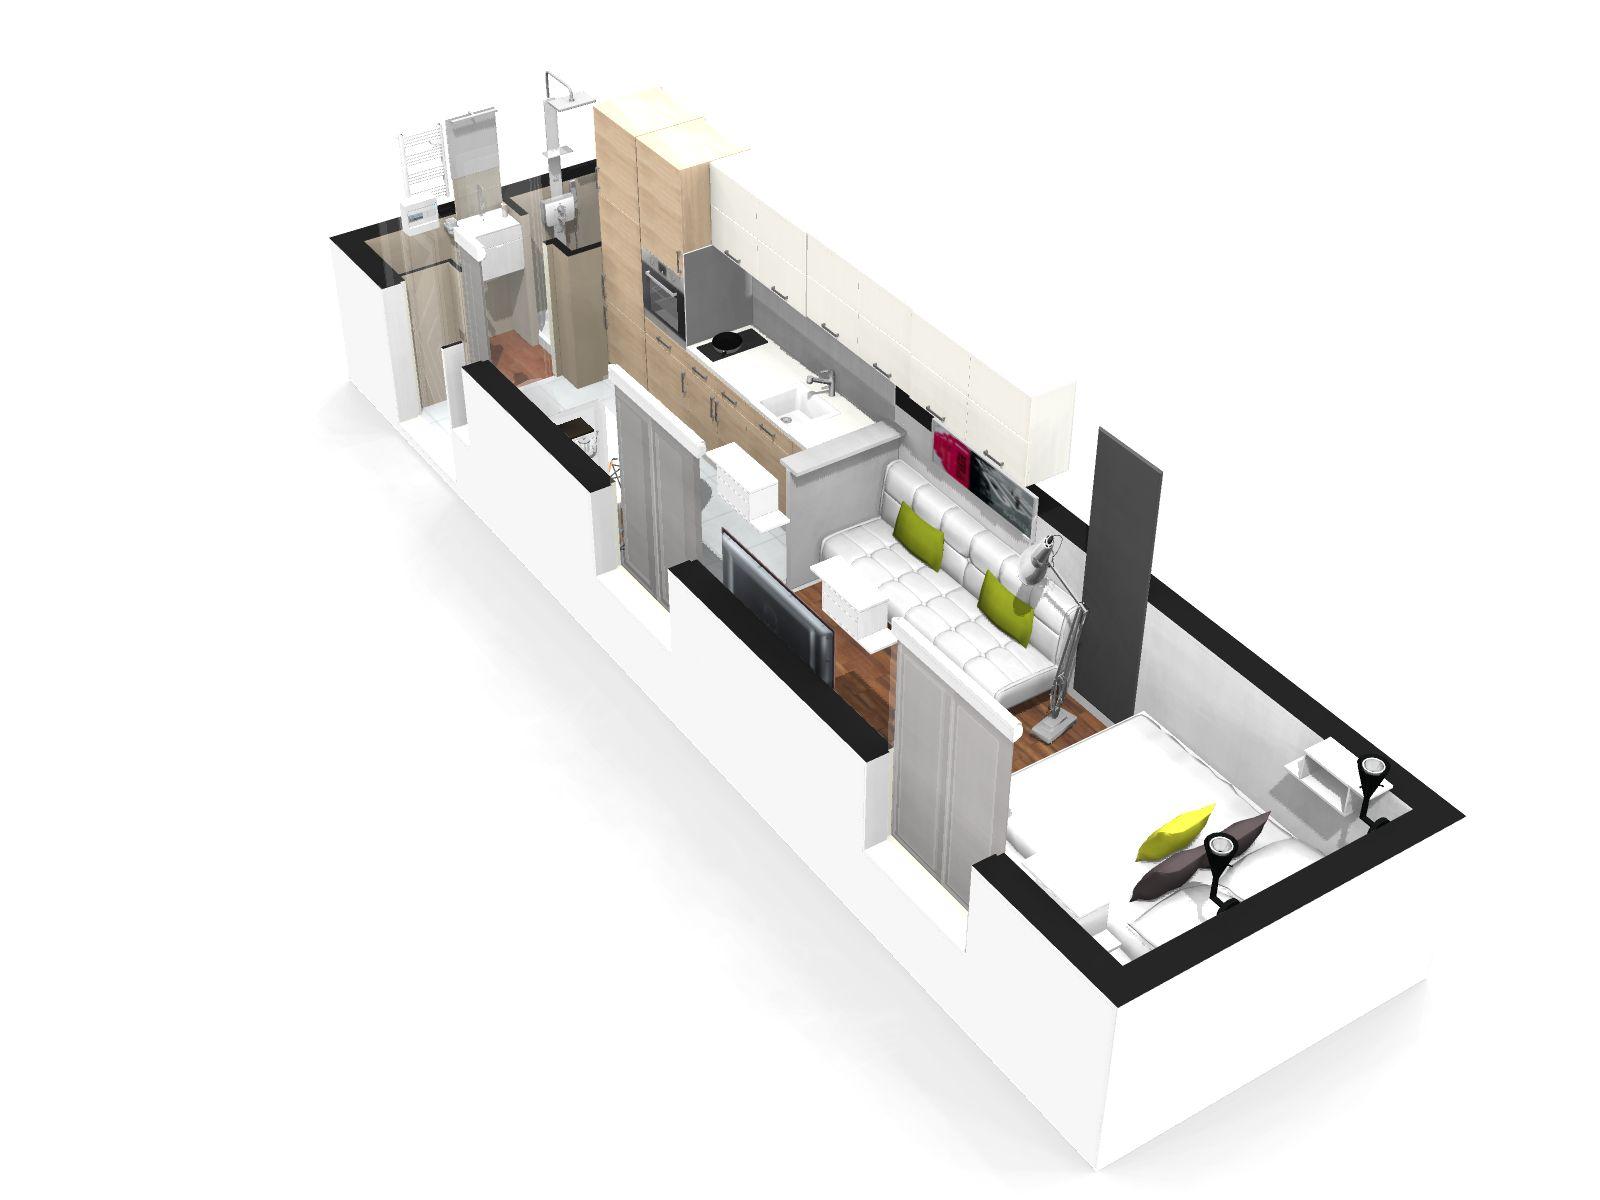 Plan Maison Tout En Longueur Full Size Of Idee Plan Maison En